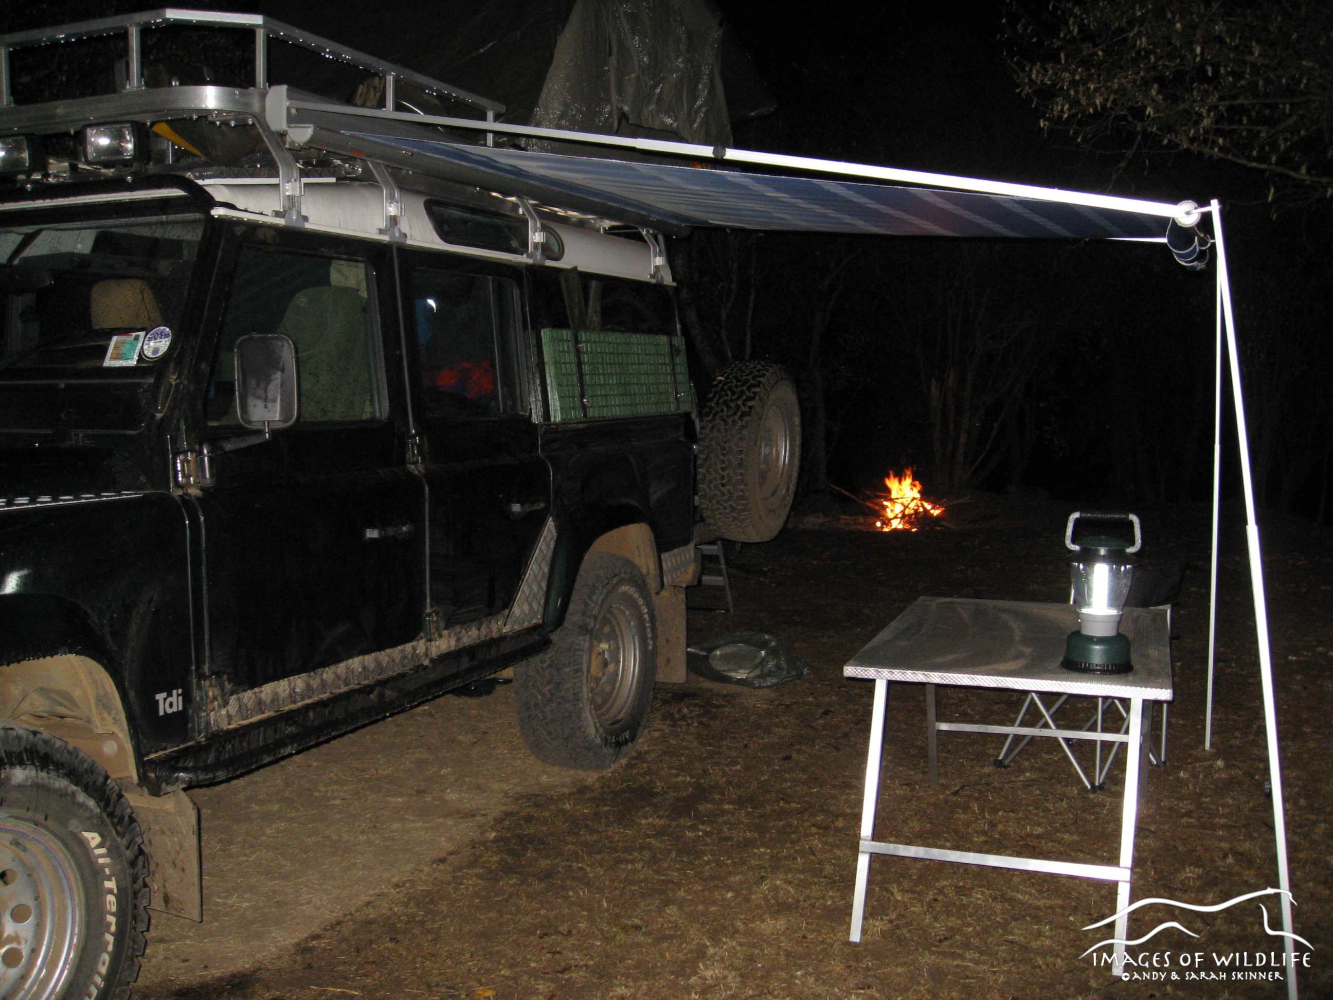 Bush camping adventures